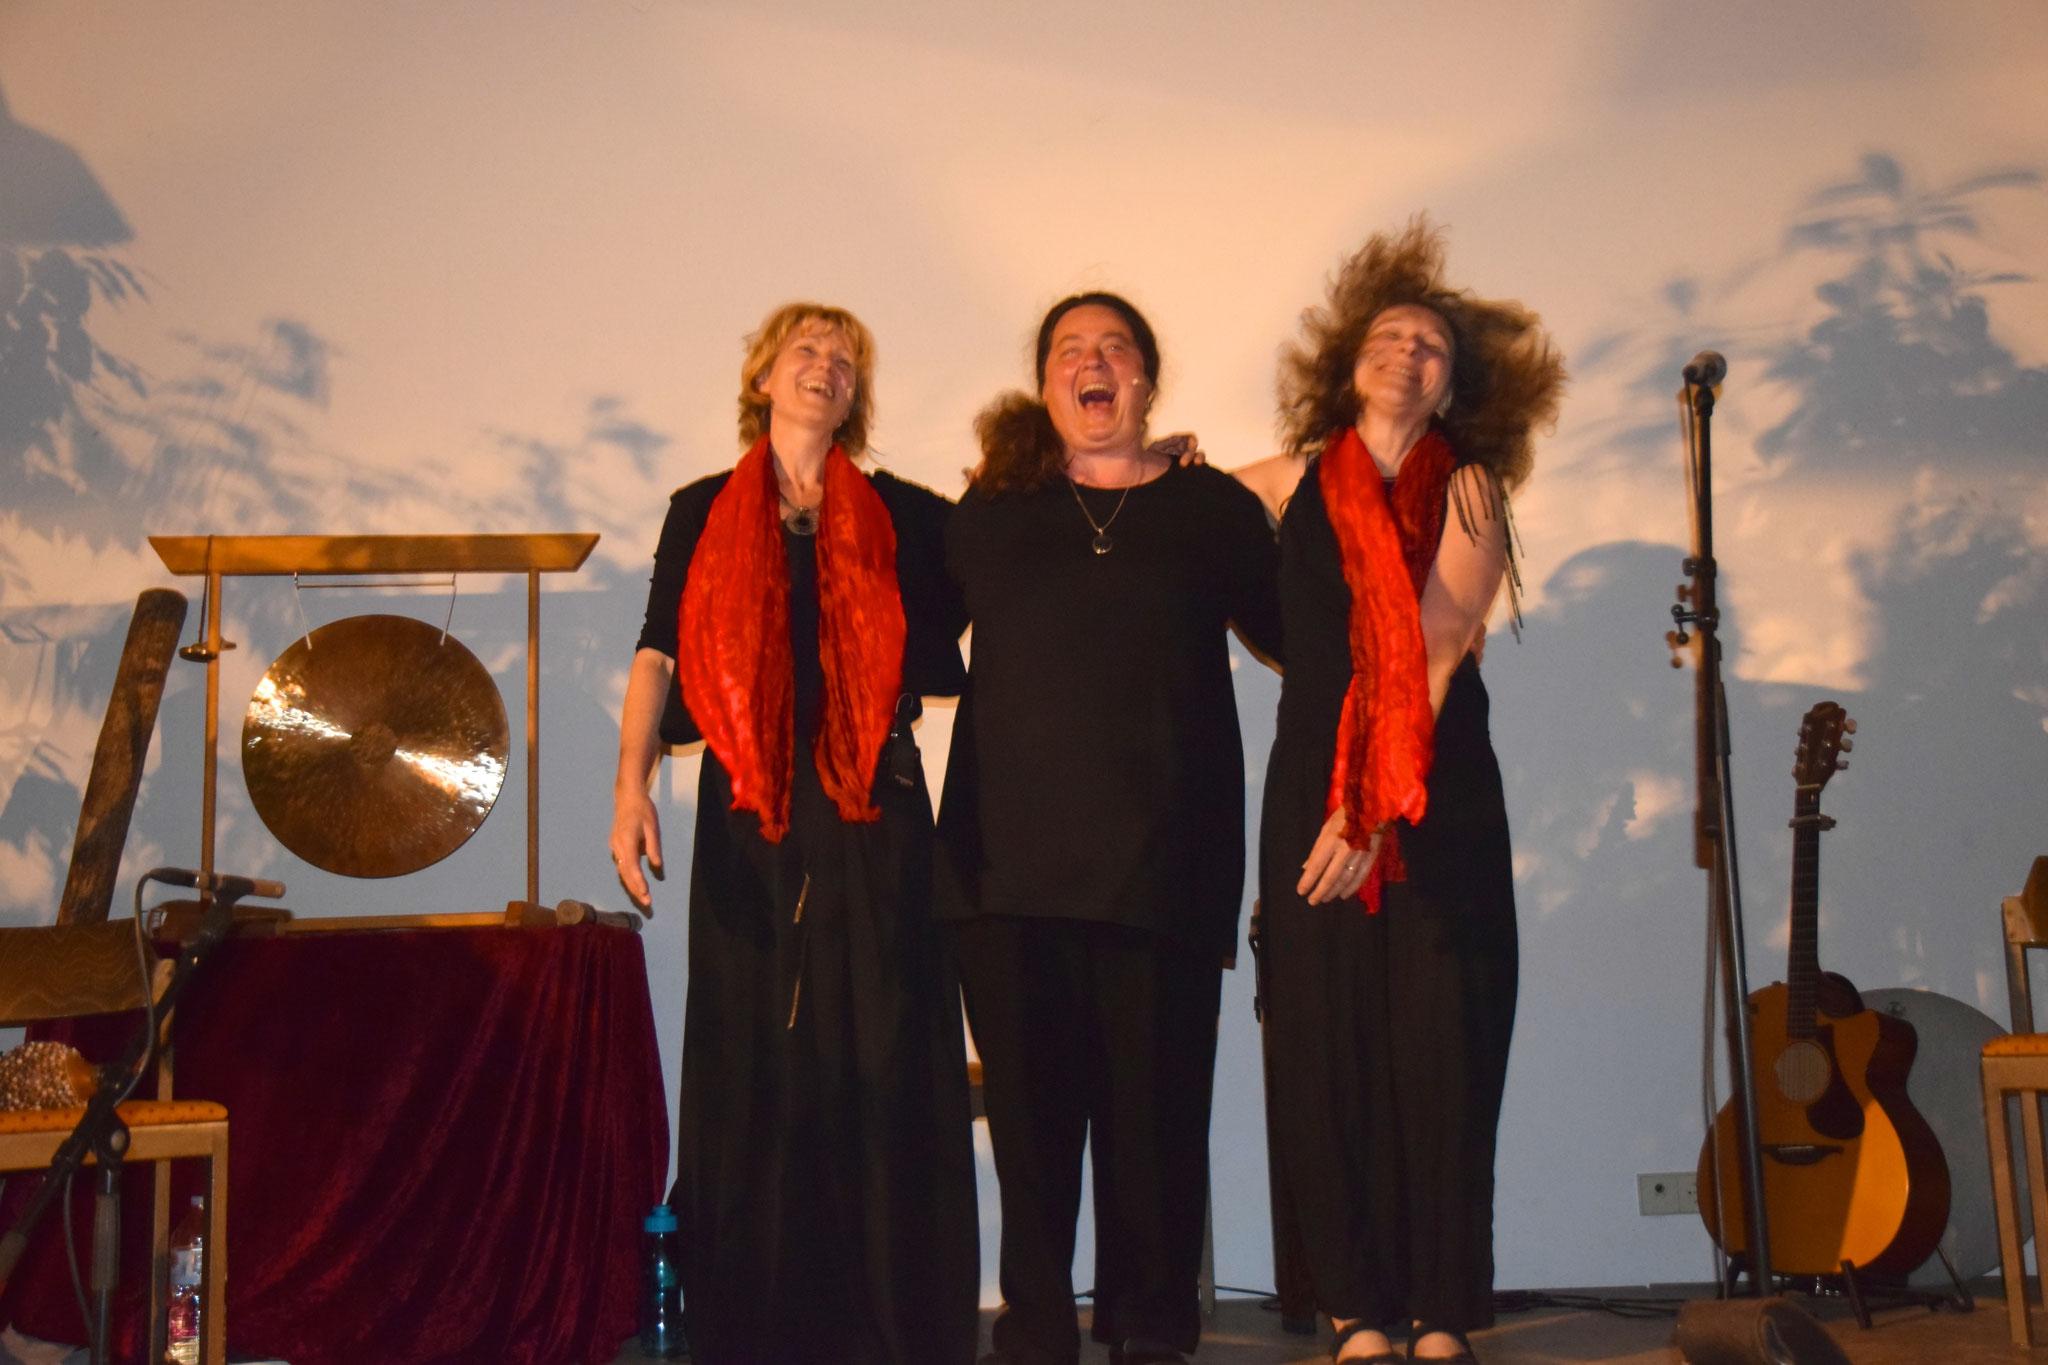 10.06.2016 Erstes GIS- Konzert in Immenstadt, Kath. Pfarrsaal